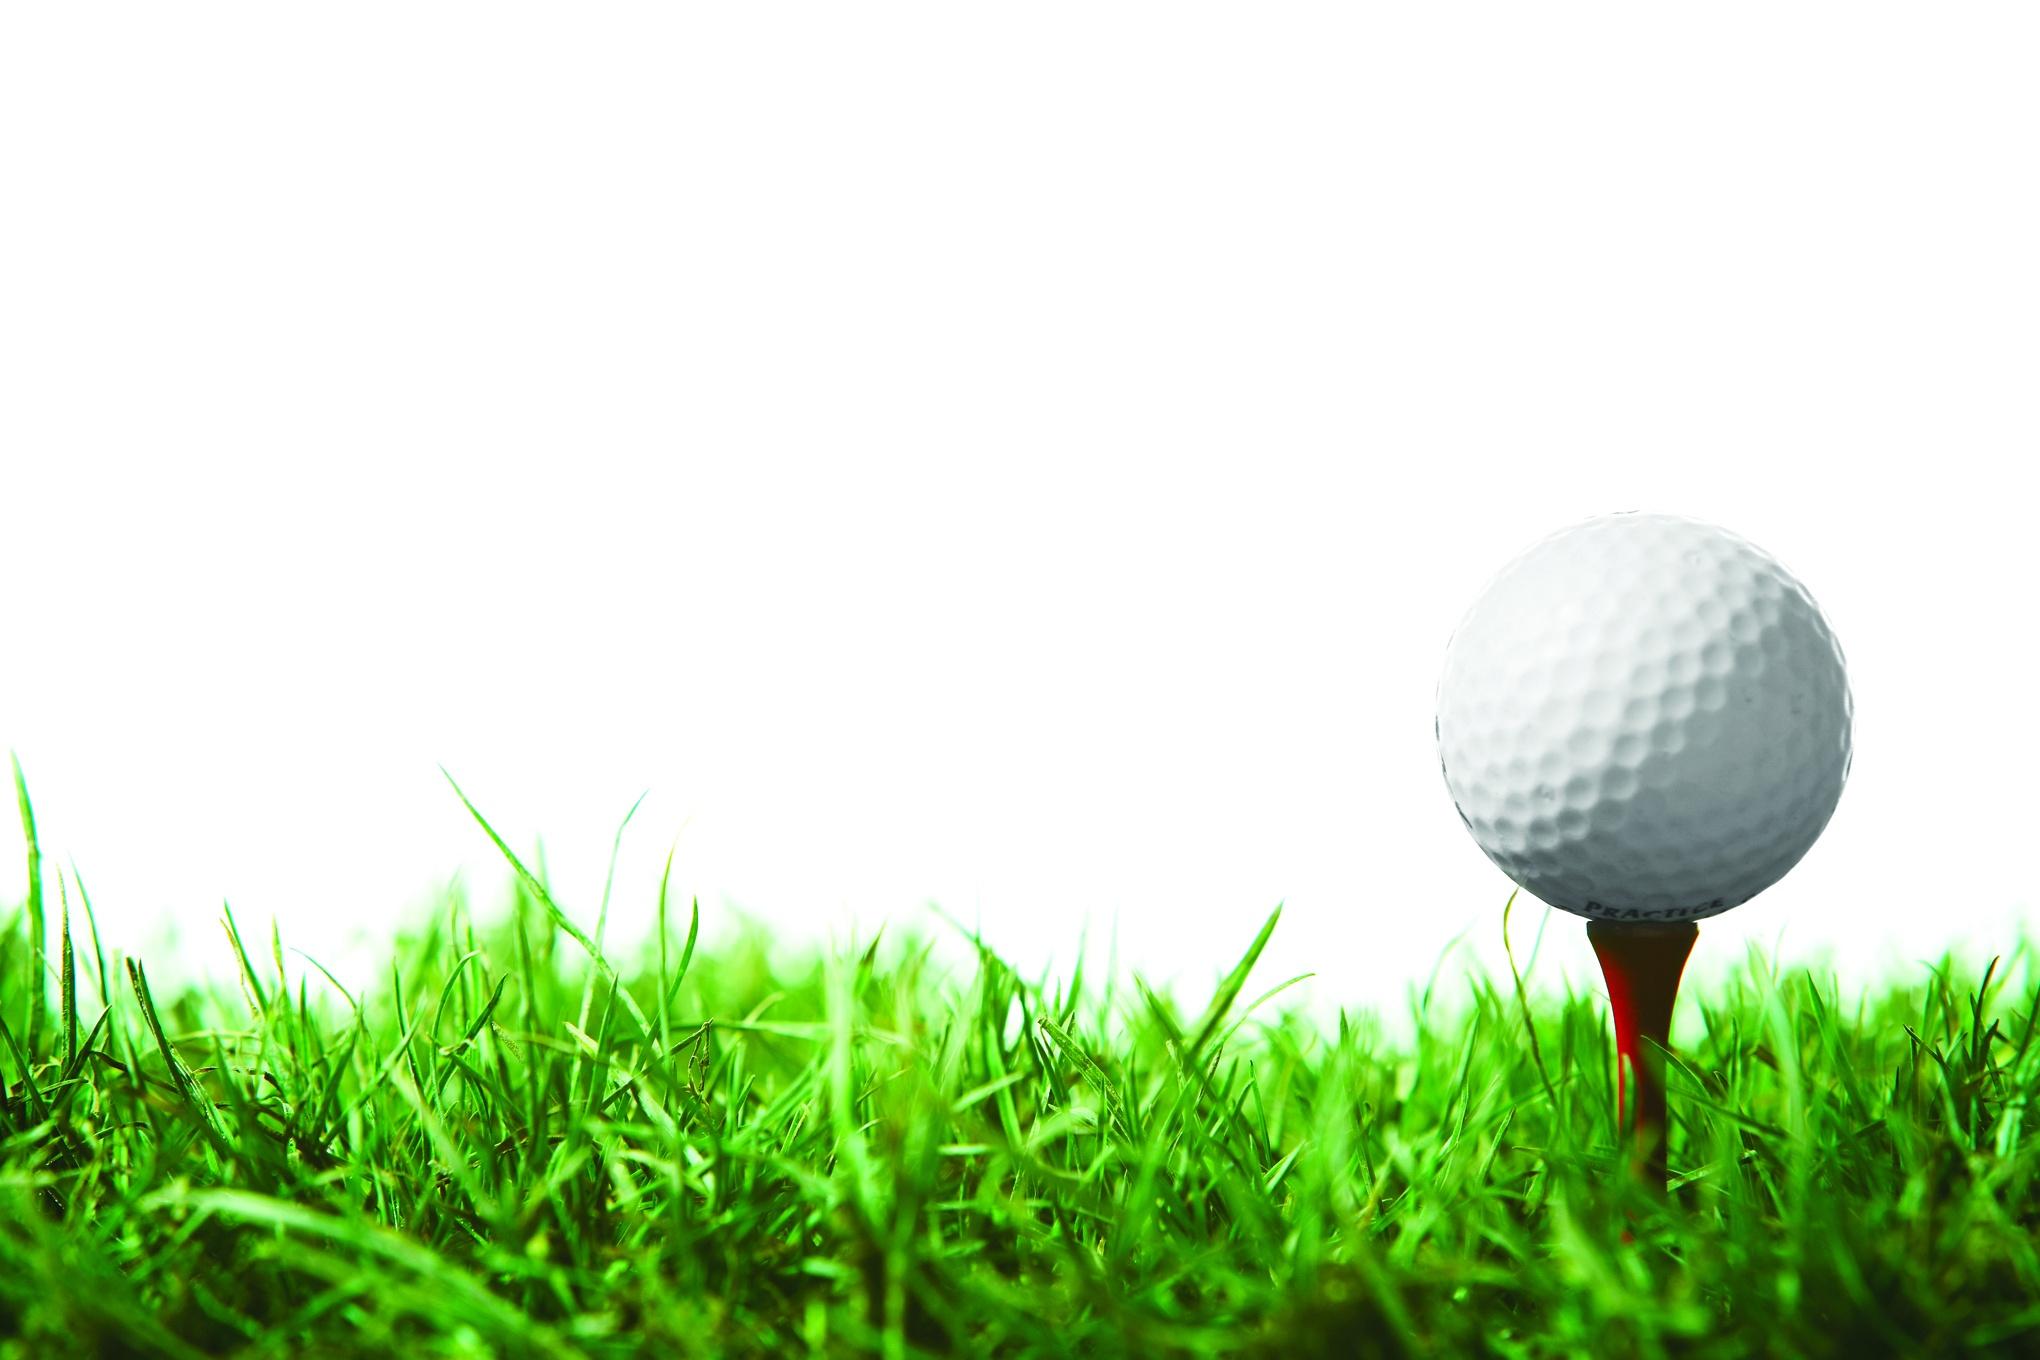 Free Golf Border Cliparts, Download Free Clip Art, Free Clip Art On - Free Printable Golf Stationary